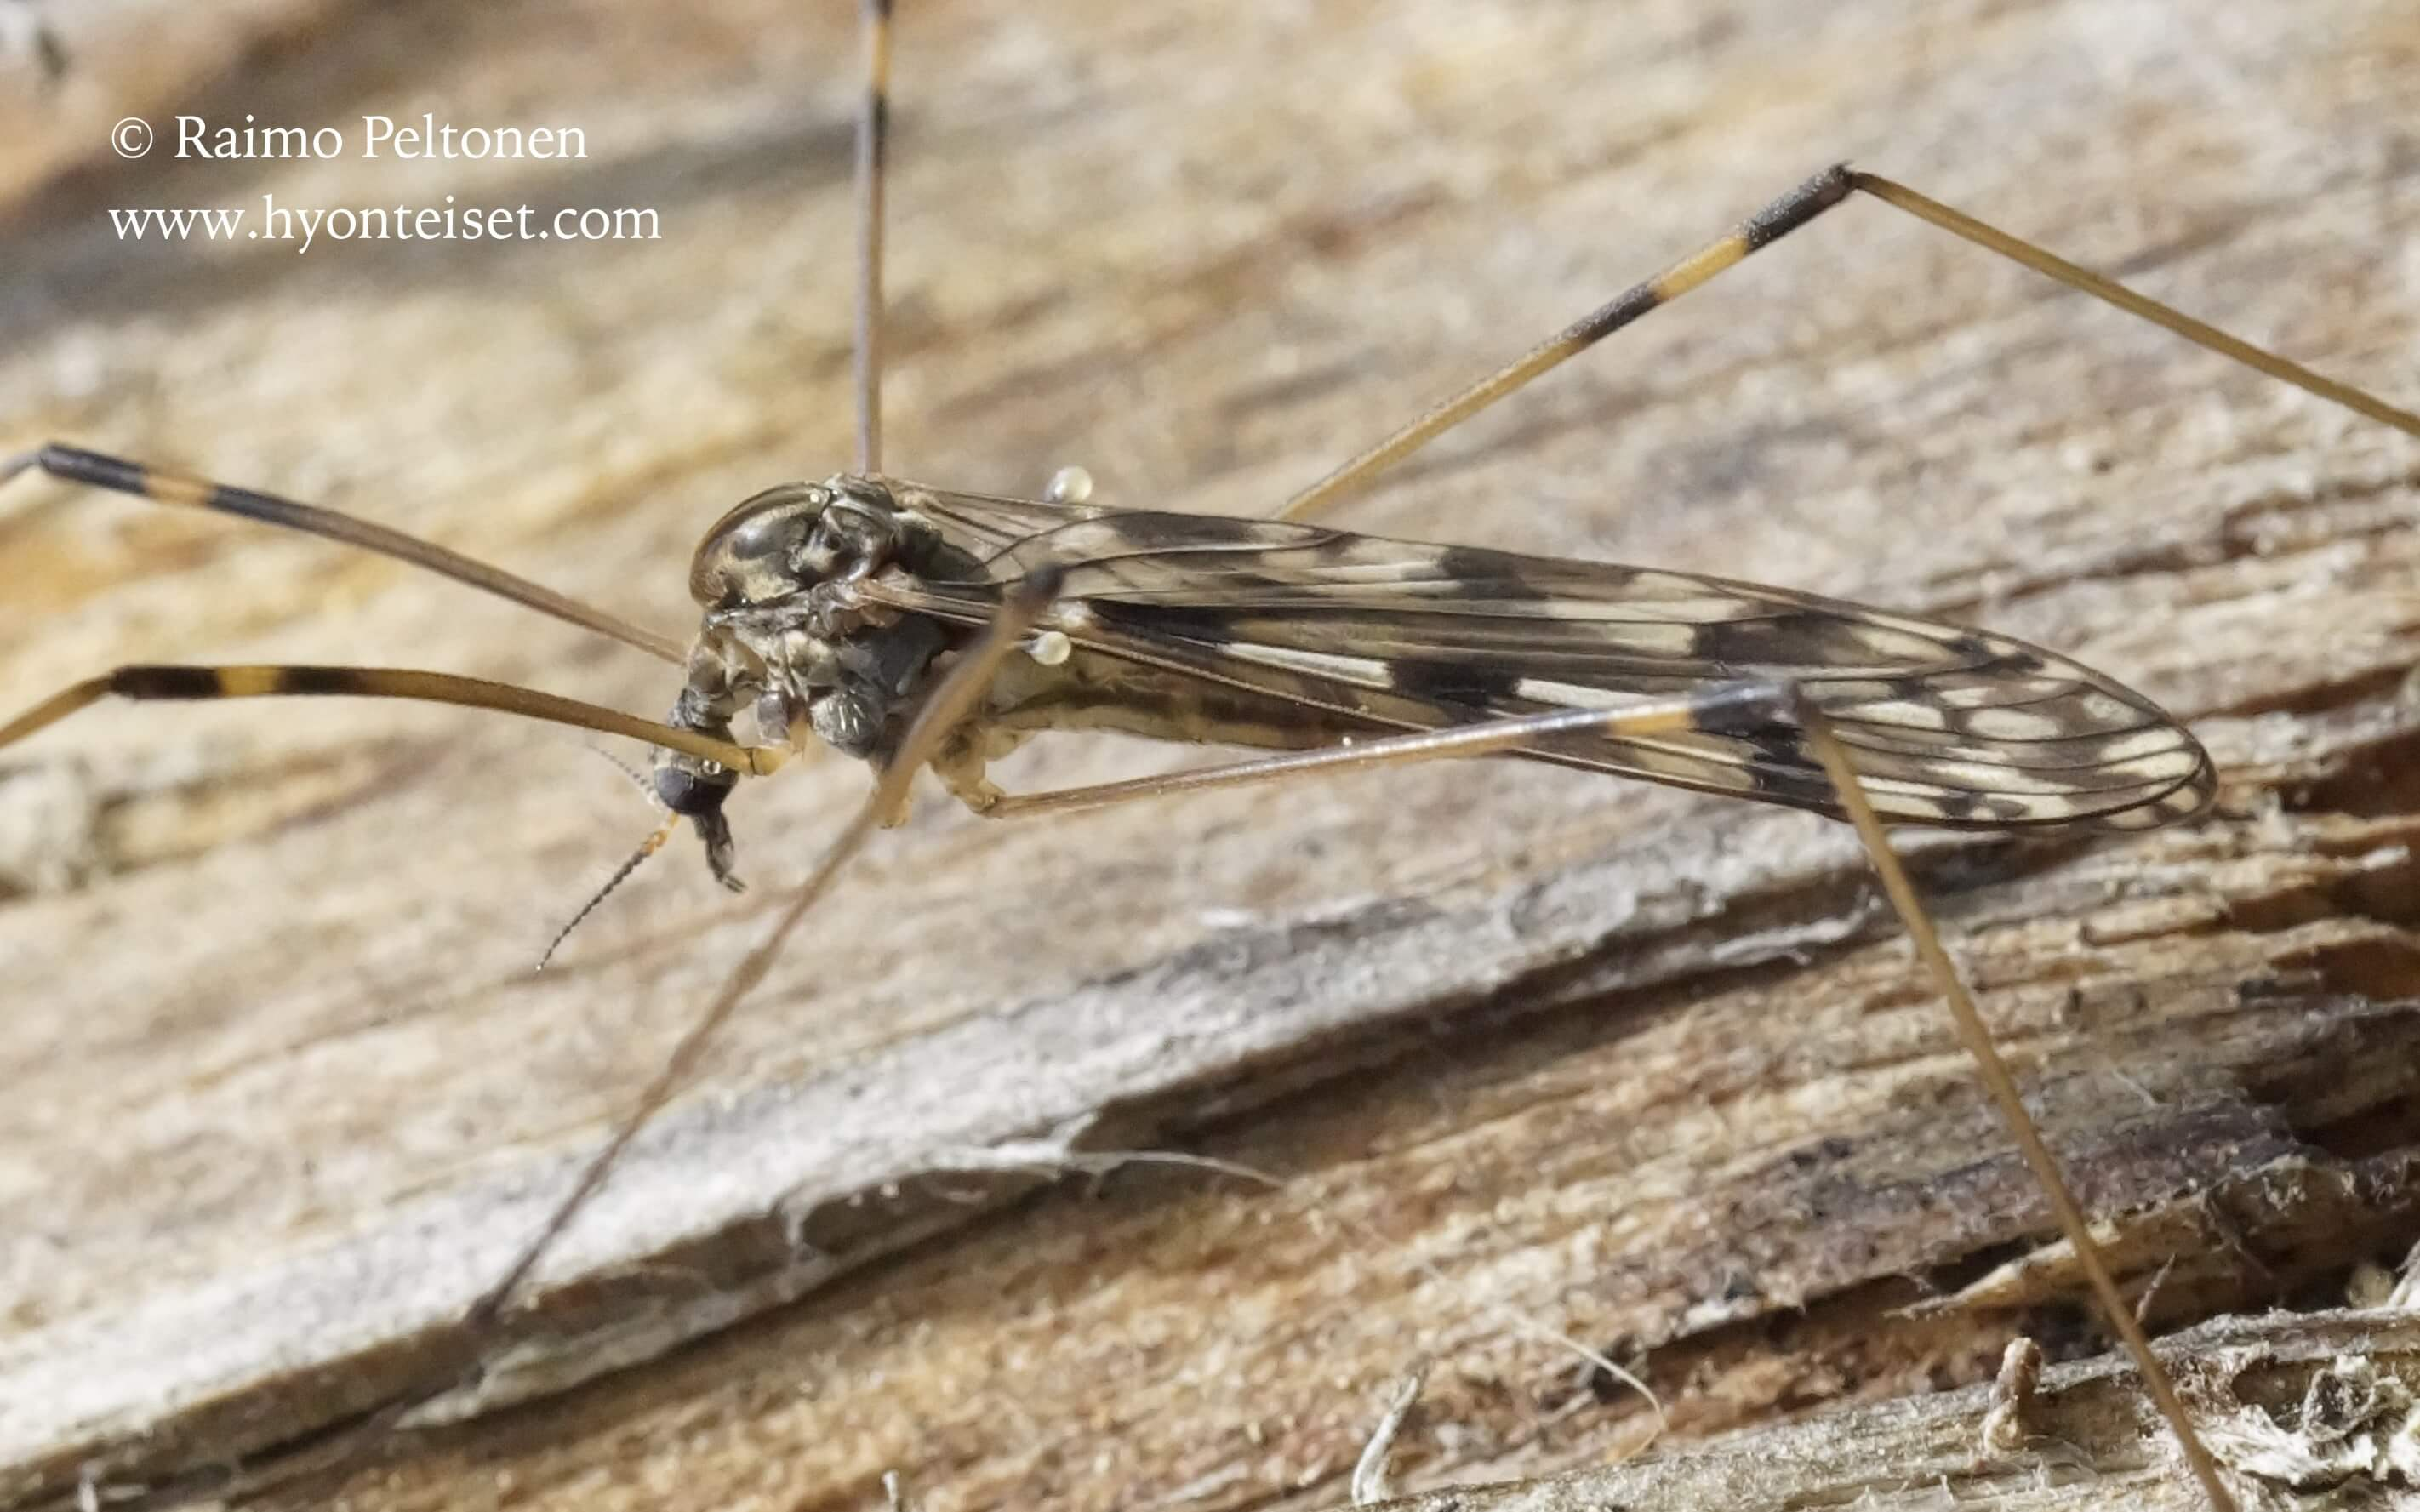 Metalimnobia quadrimaculata (det. Esko Viitanen), 18.5.2016 Jyväskylä